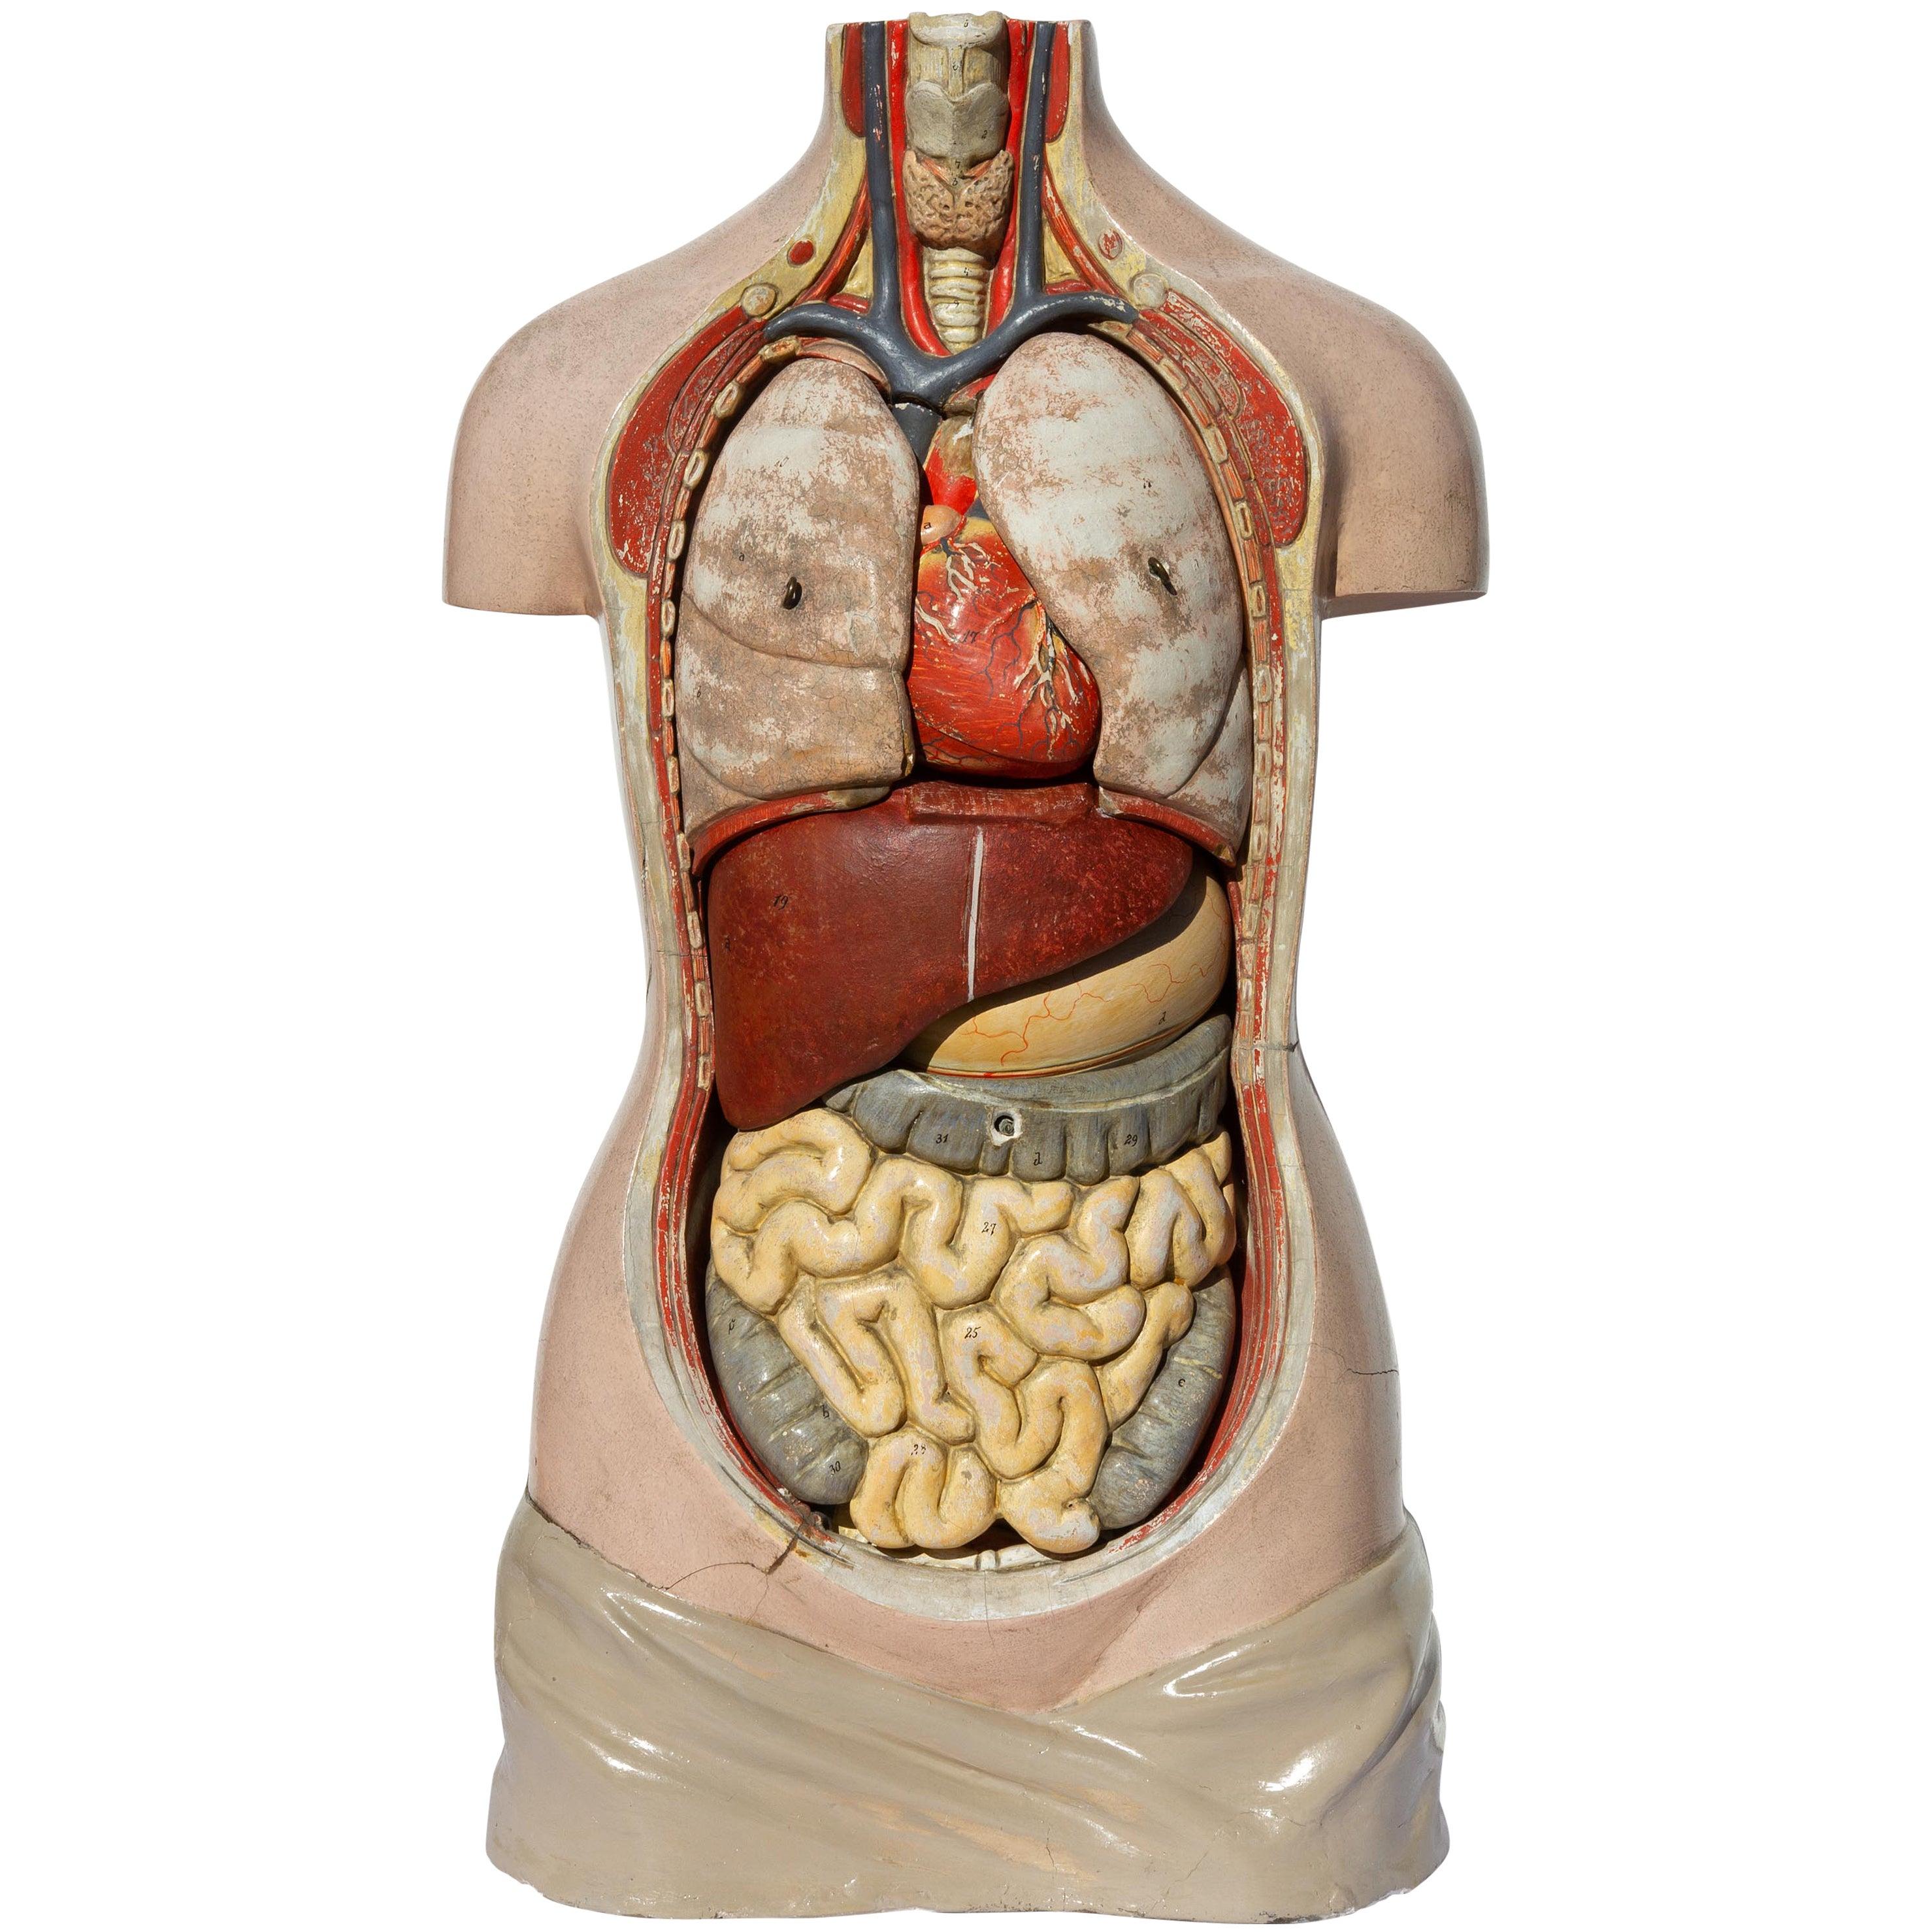 Plaster Educational Human Anatomical Model, German, 1930s